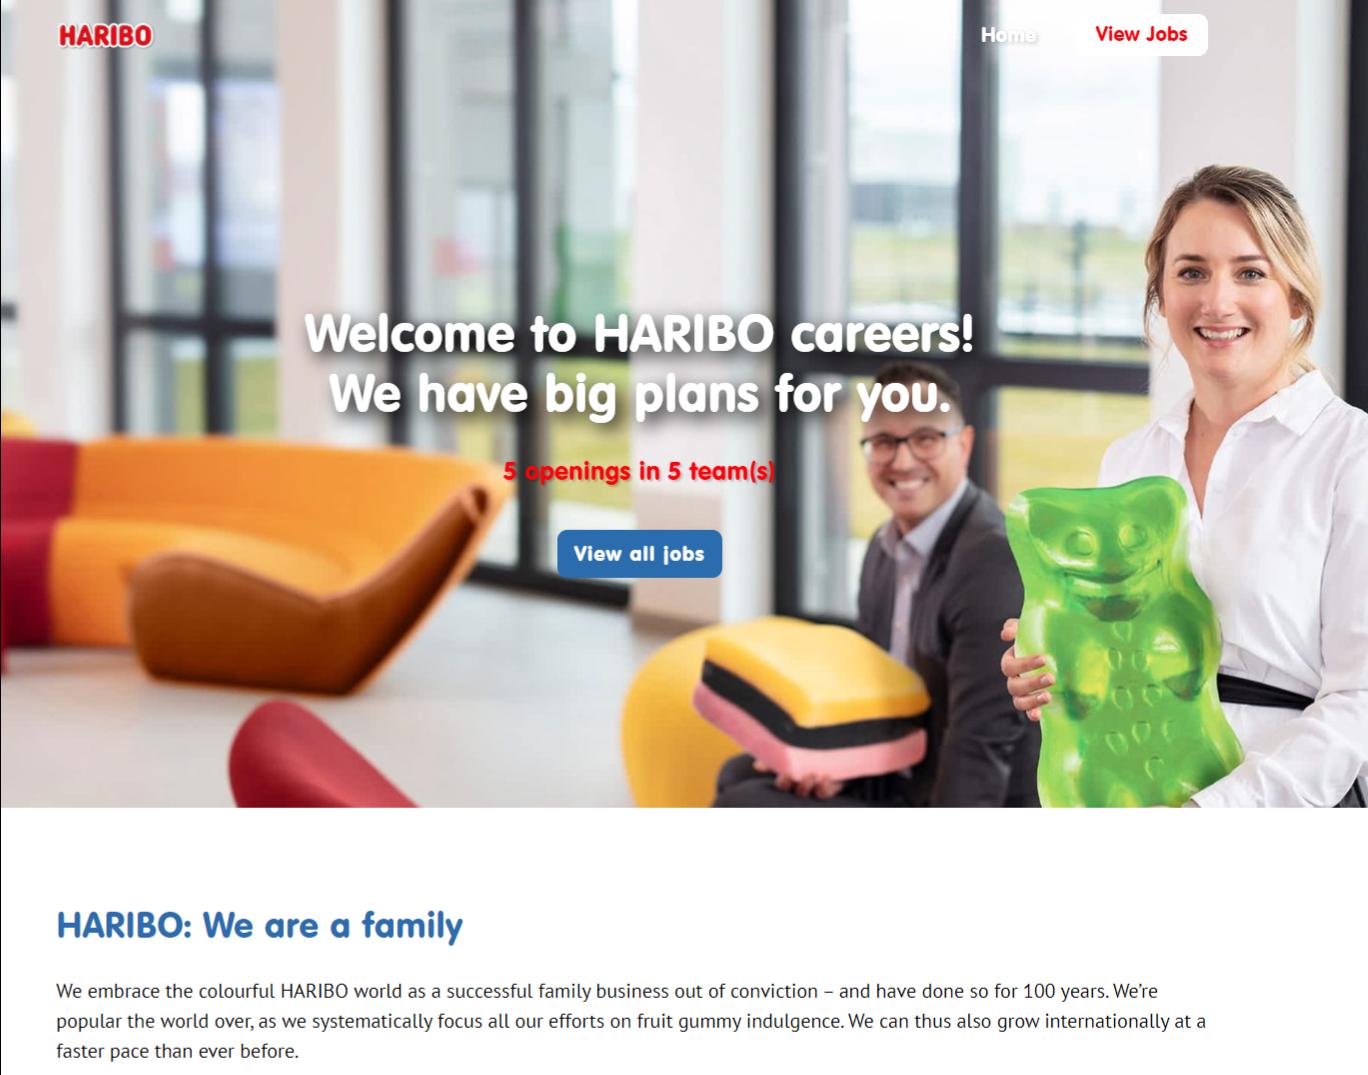 Careers site. Showing bespoke careers site created for Haribo UK.